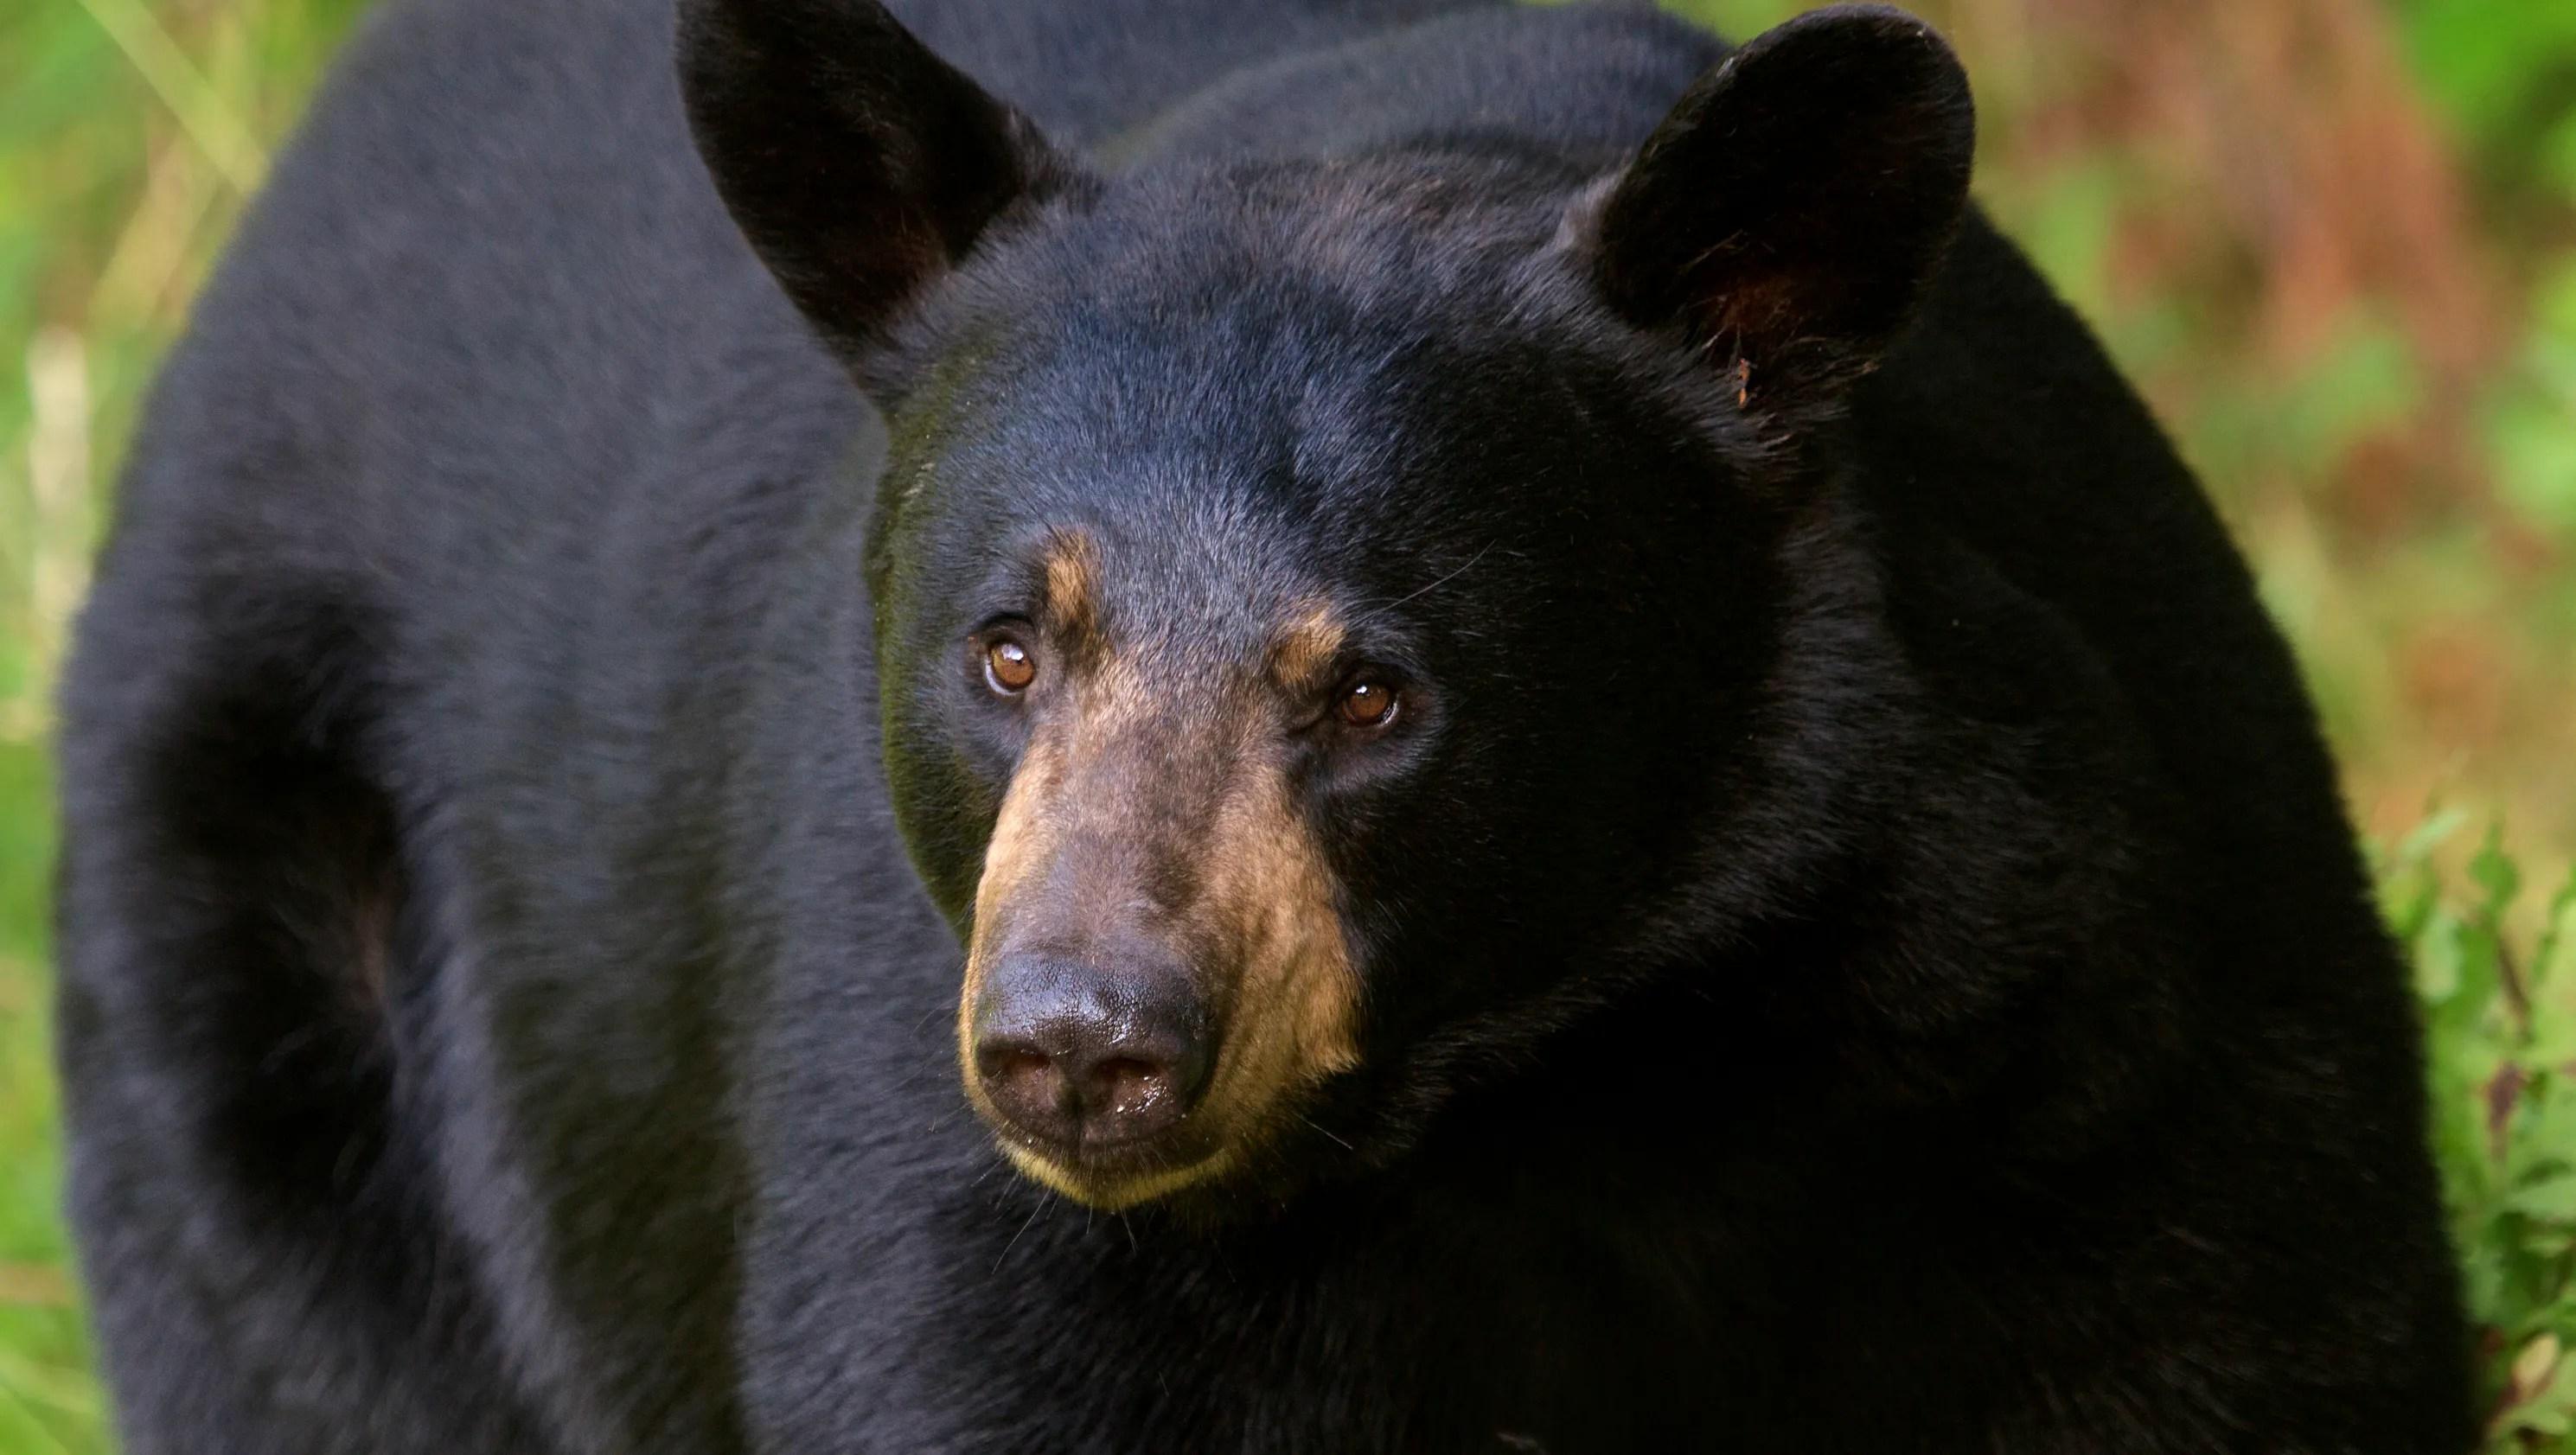 Black Bear Population Booming In Northern Michigan